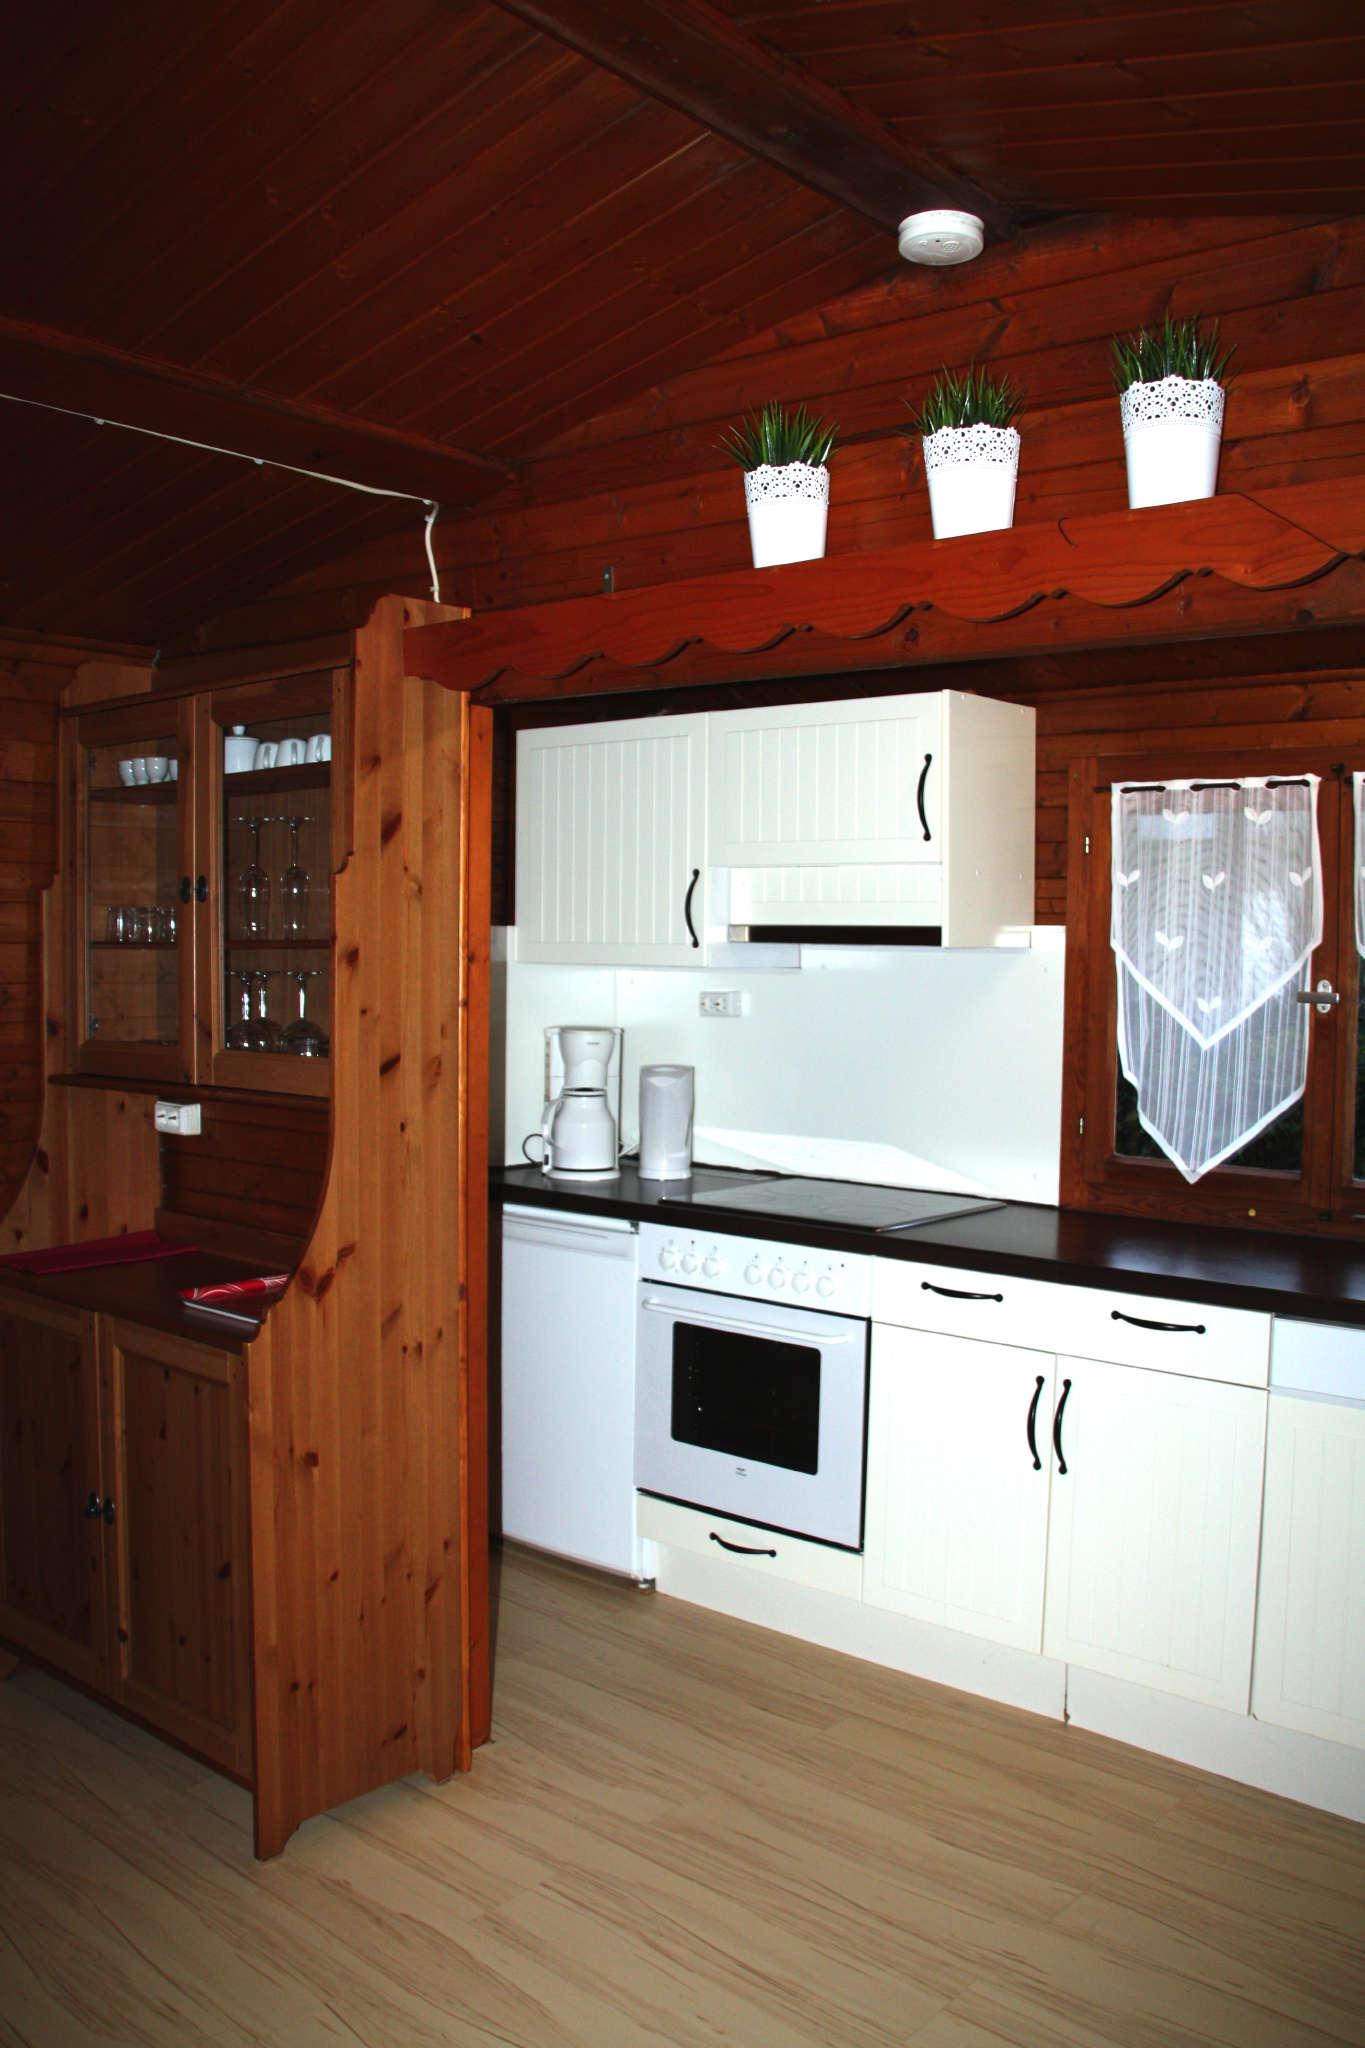 Badespass mit Ruderboot